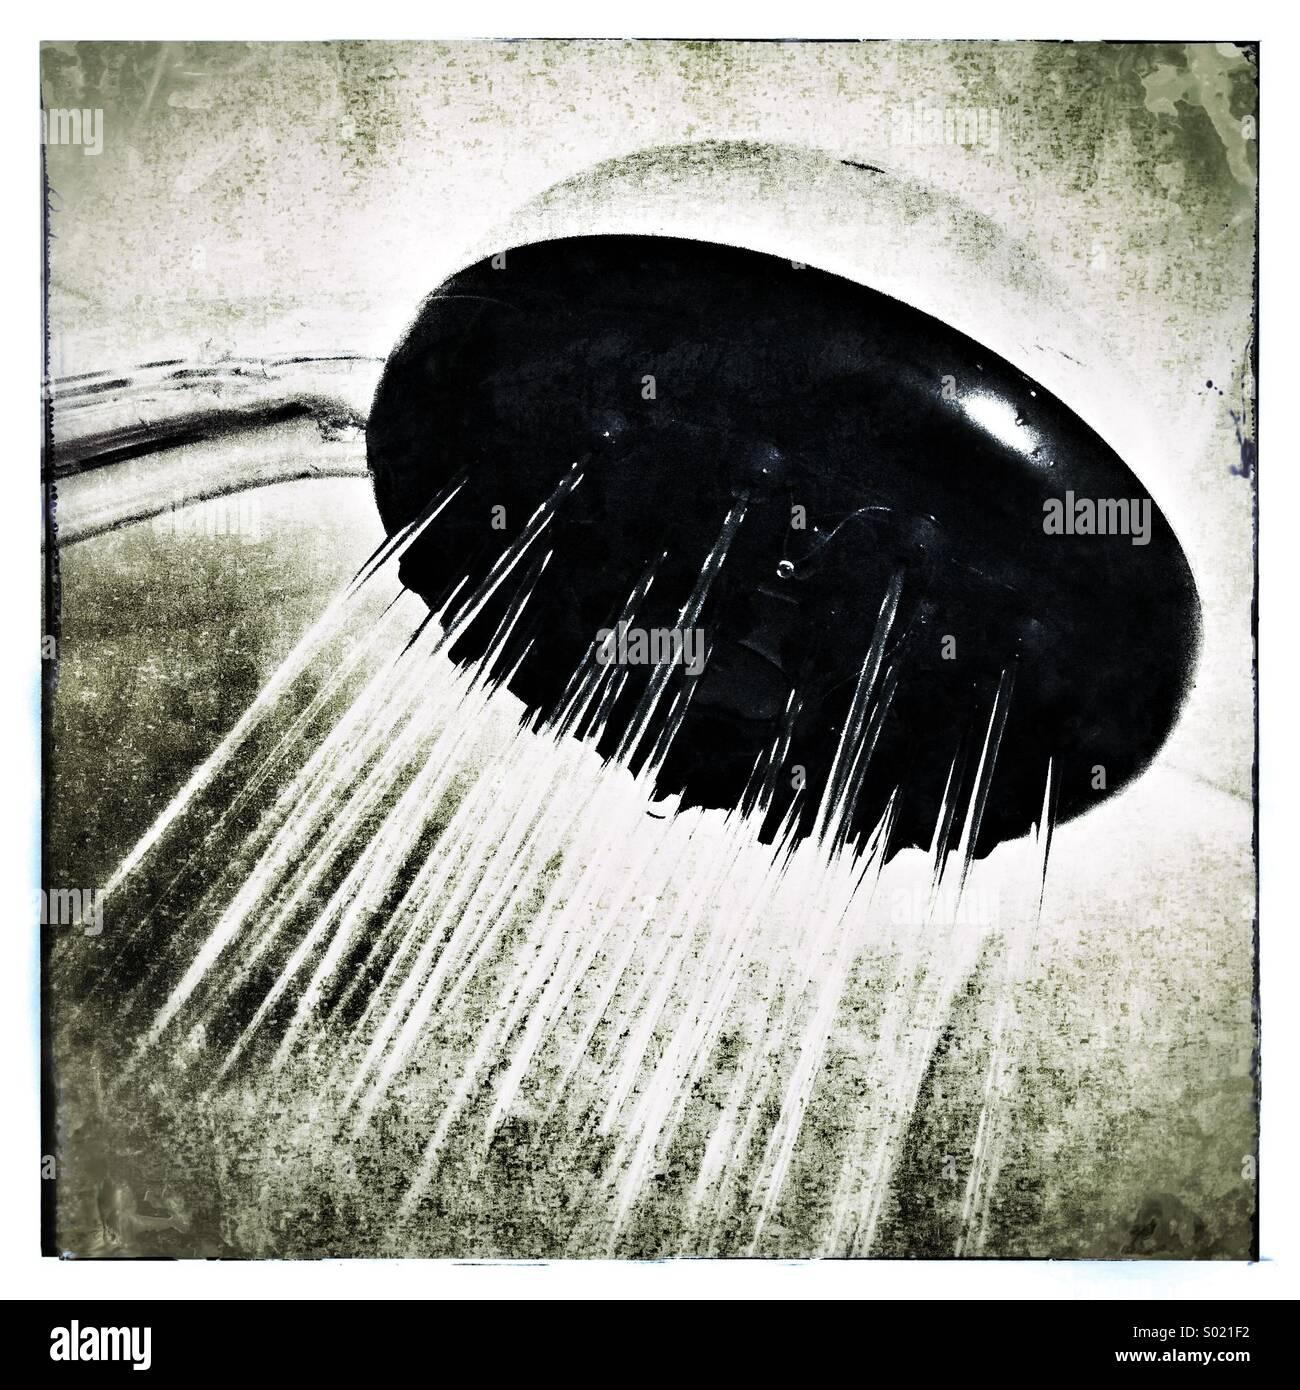 Shower - Stock Image